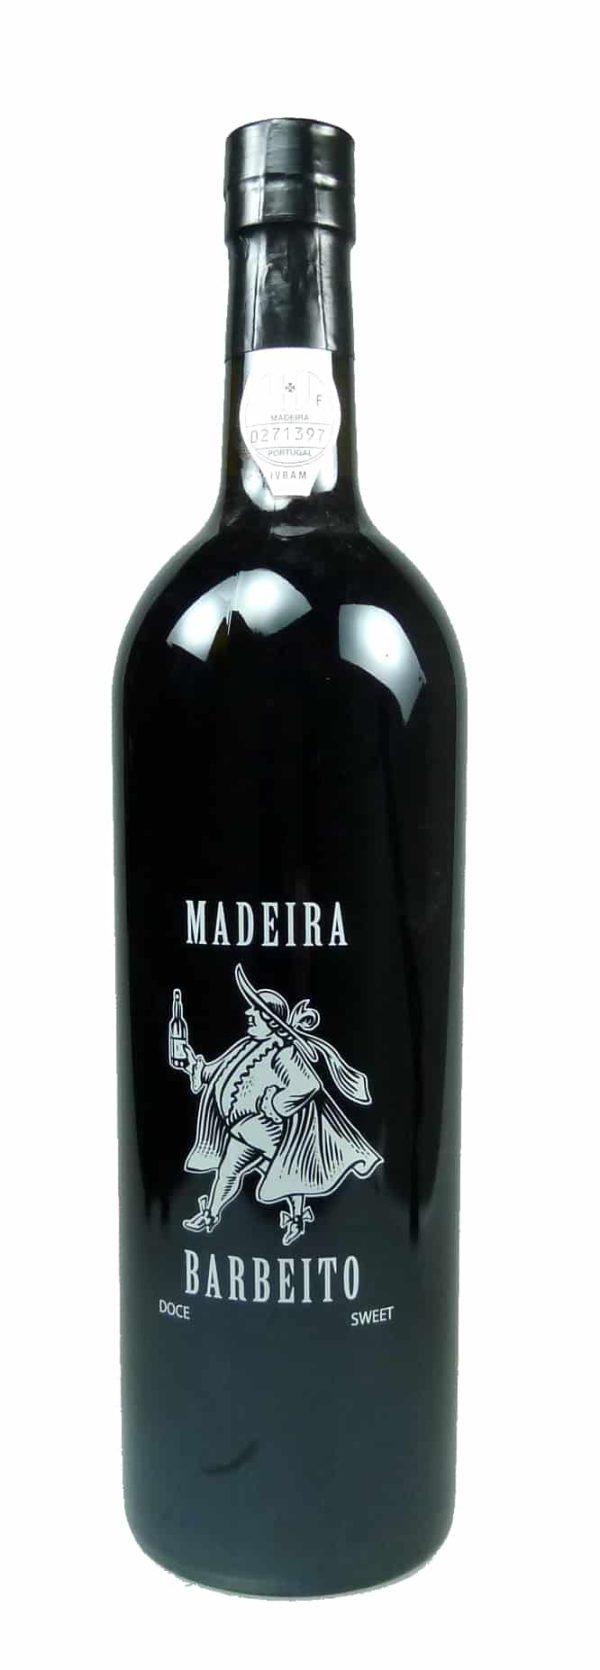 Barbeito sweet Madeira 3 Jahre alt